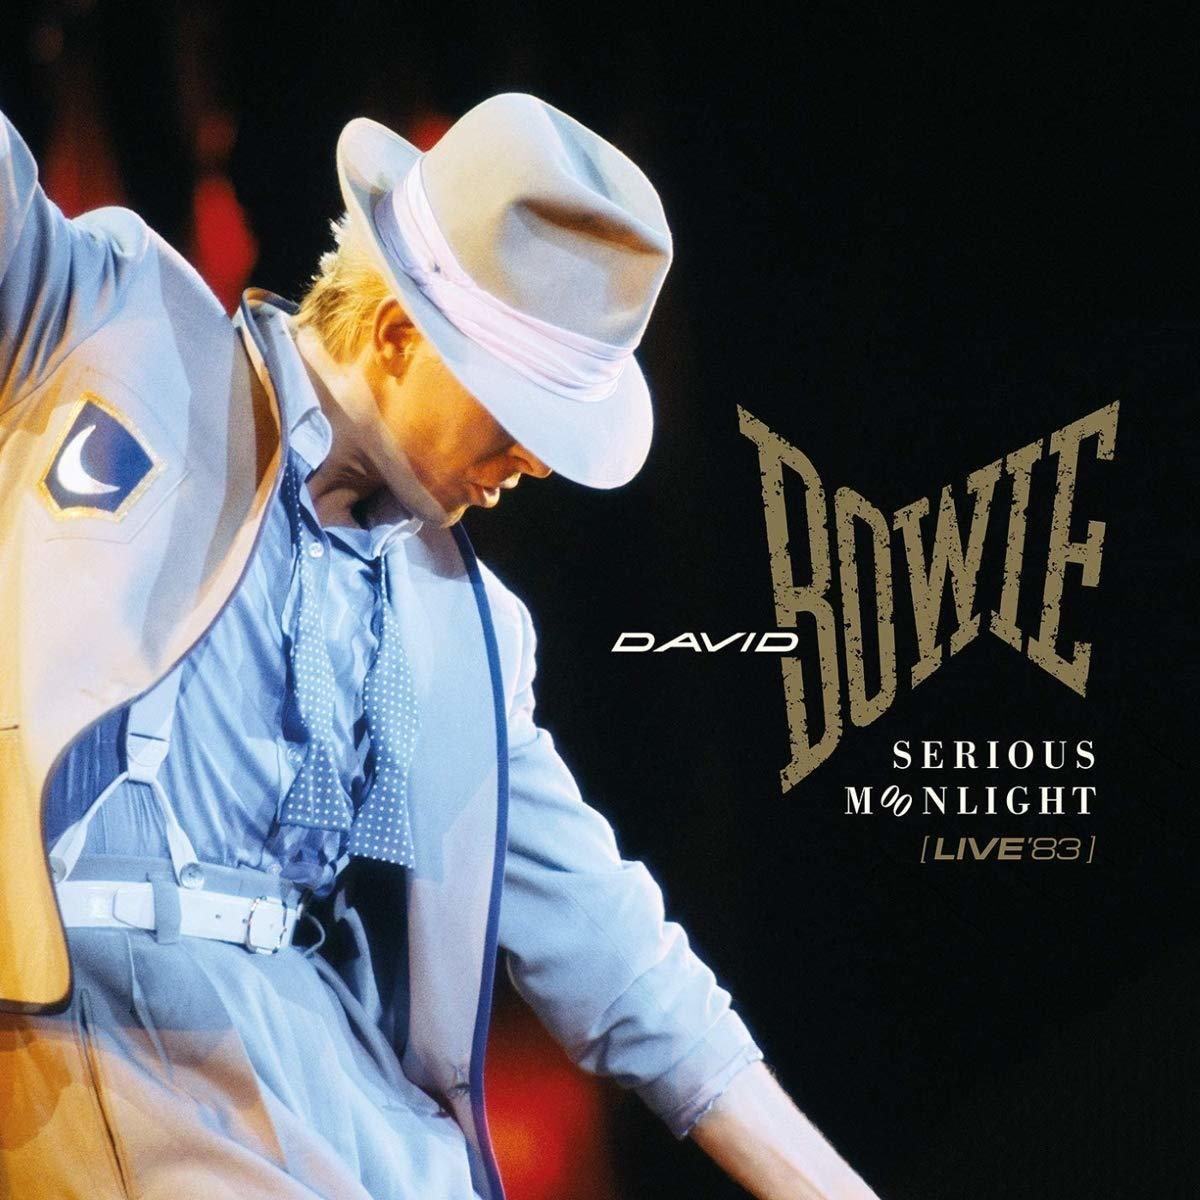 BOWIE, DAVID: Serious Moonlight (Live '83)